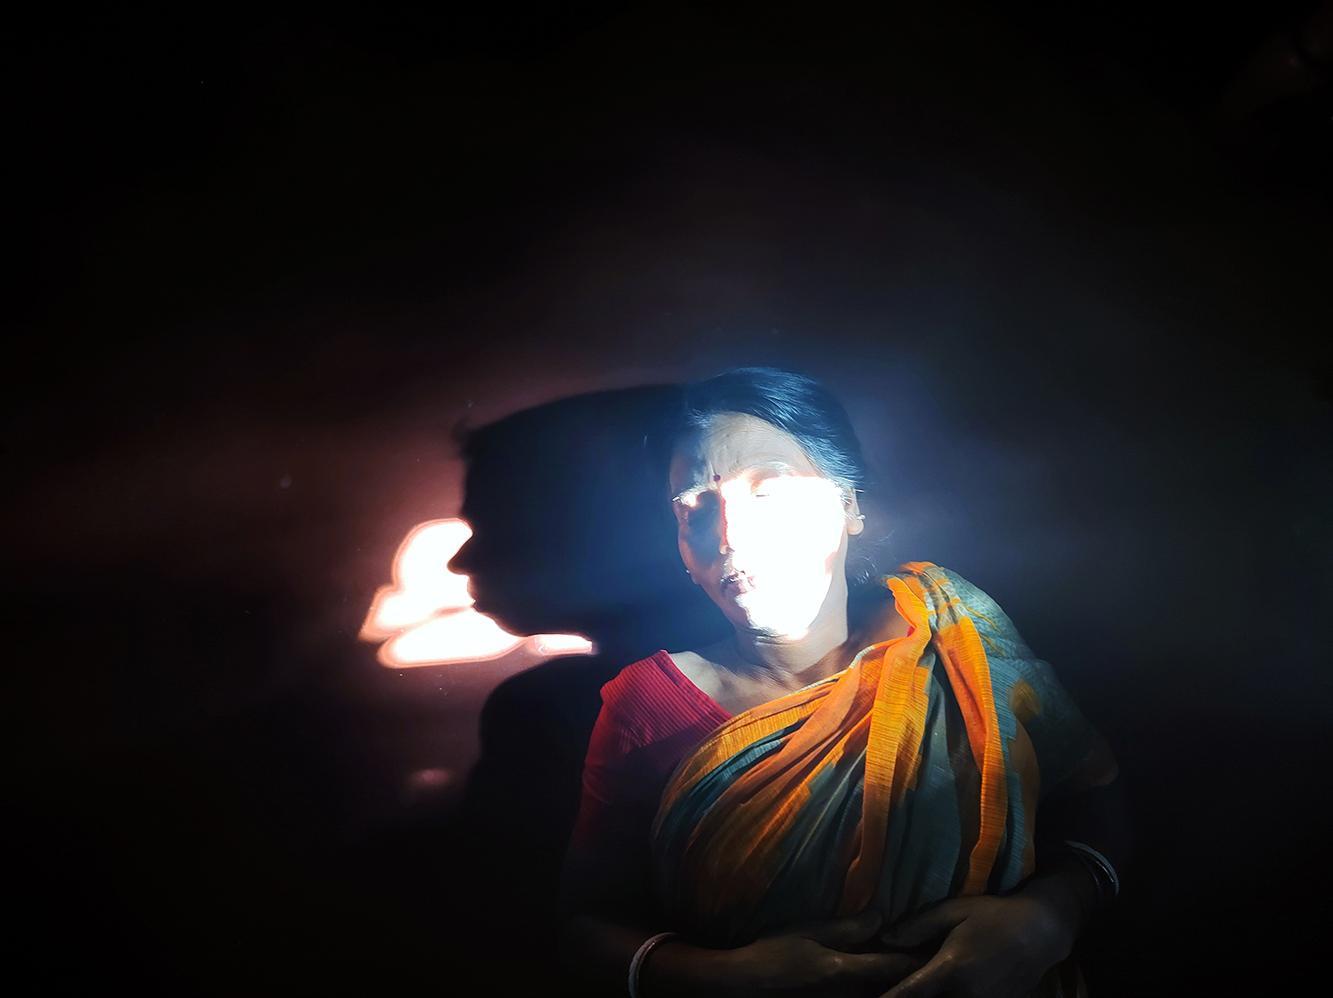 Photography image - Loading Ranita_Roy.jpg